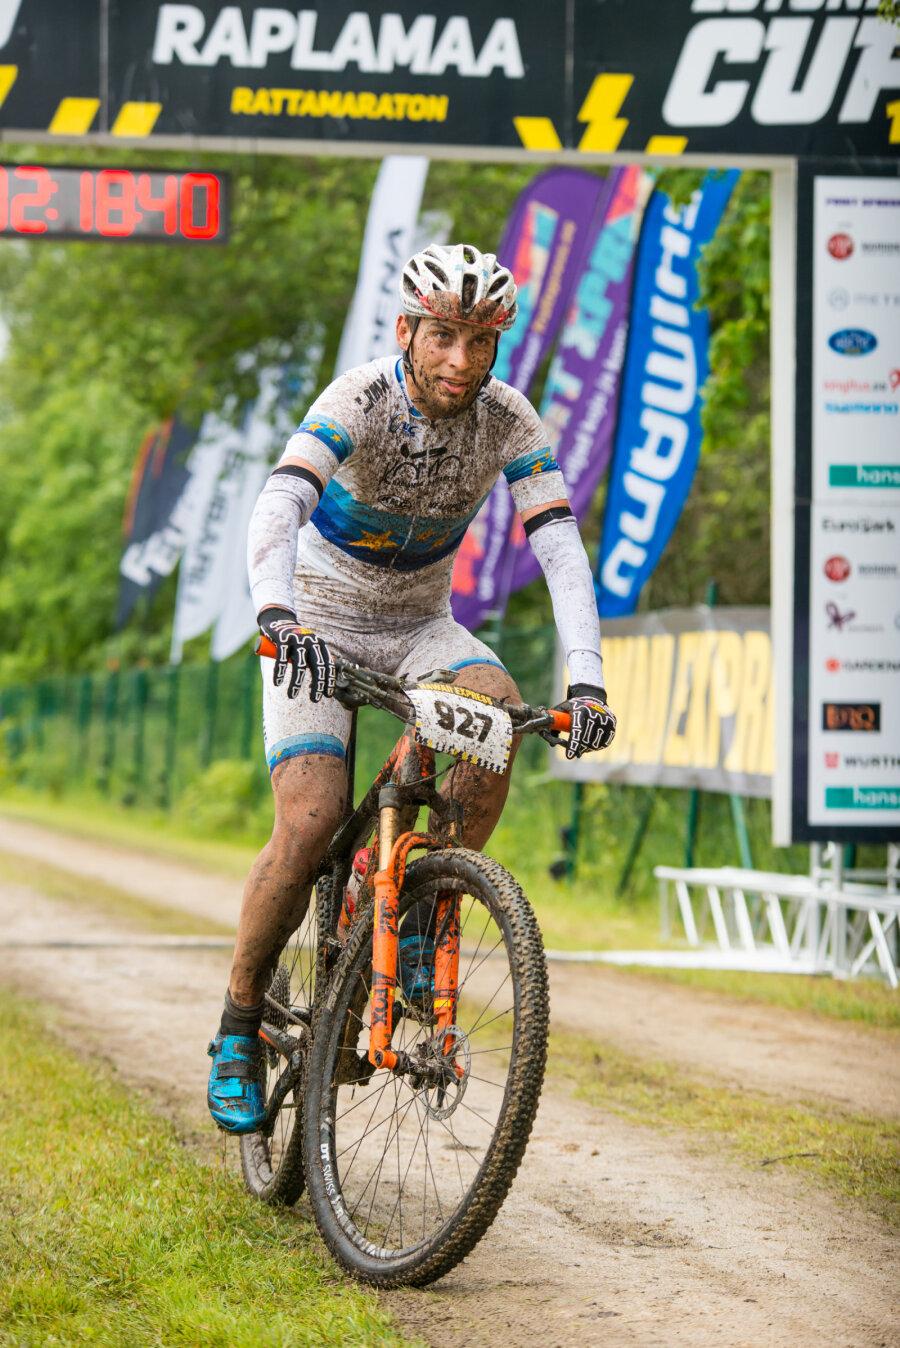 "<span>Raplamaa rattamaratoni võitja Peeter Pruus finishijoonel.</span><span class=""right"">Hawaii Express Estonian Cup</span>"